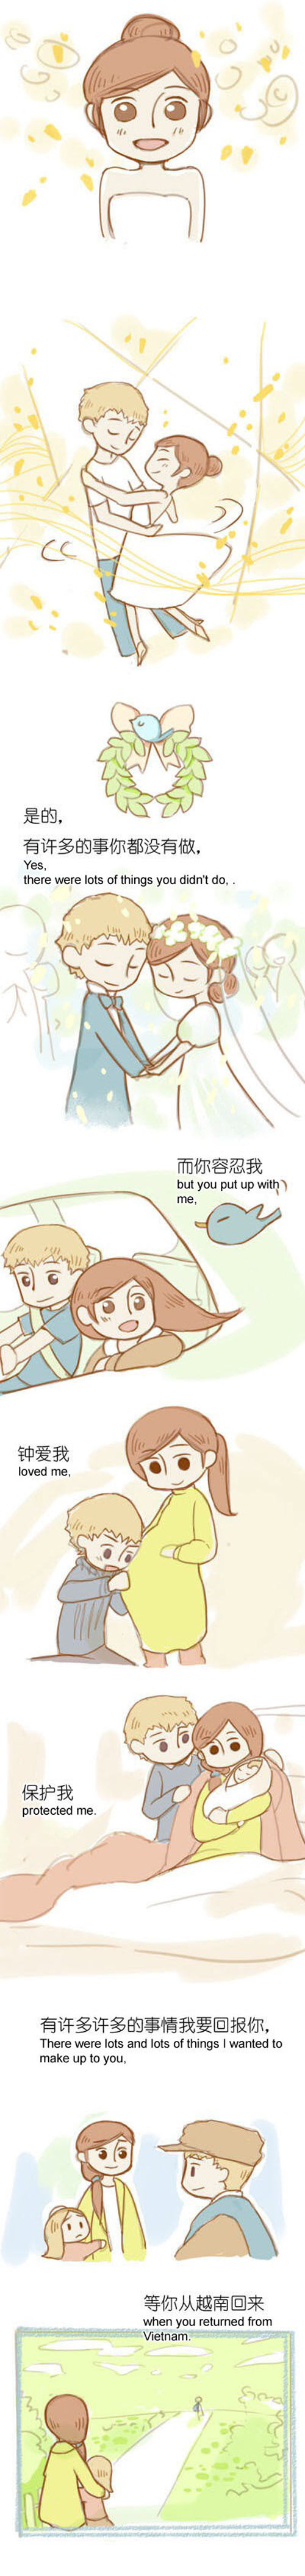 funny-car-couple-comic-story